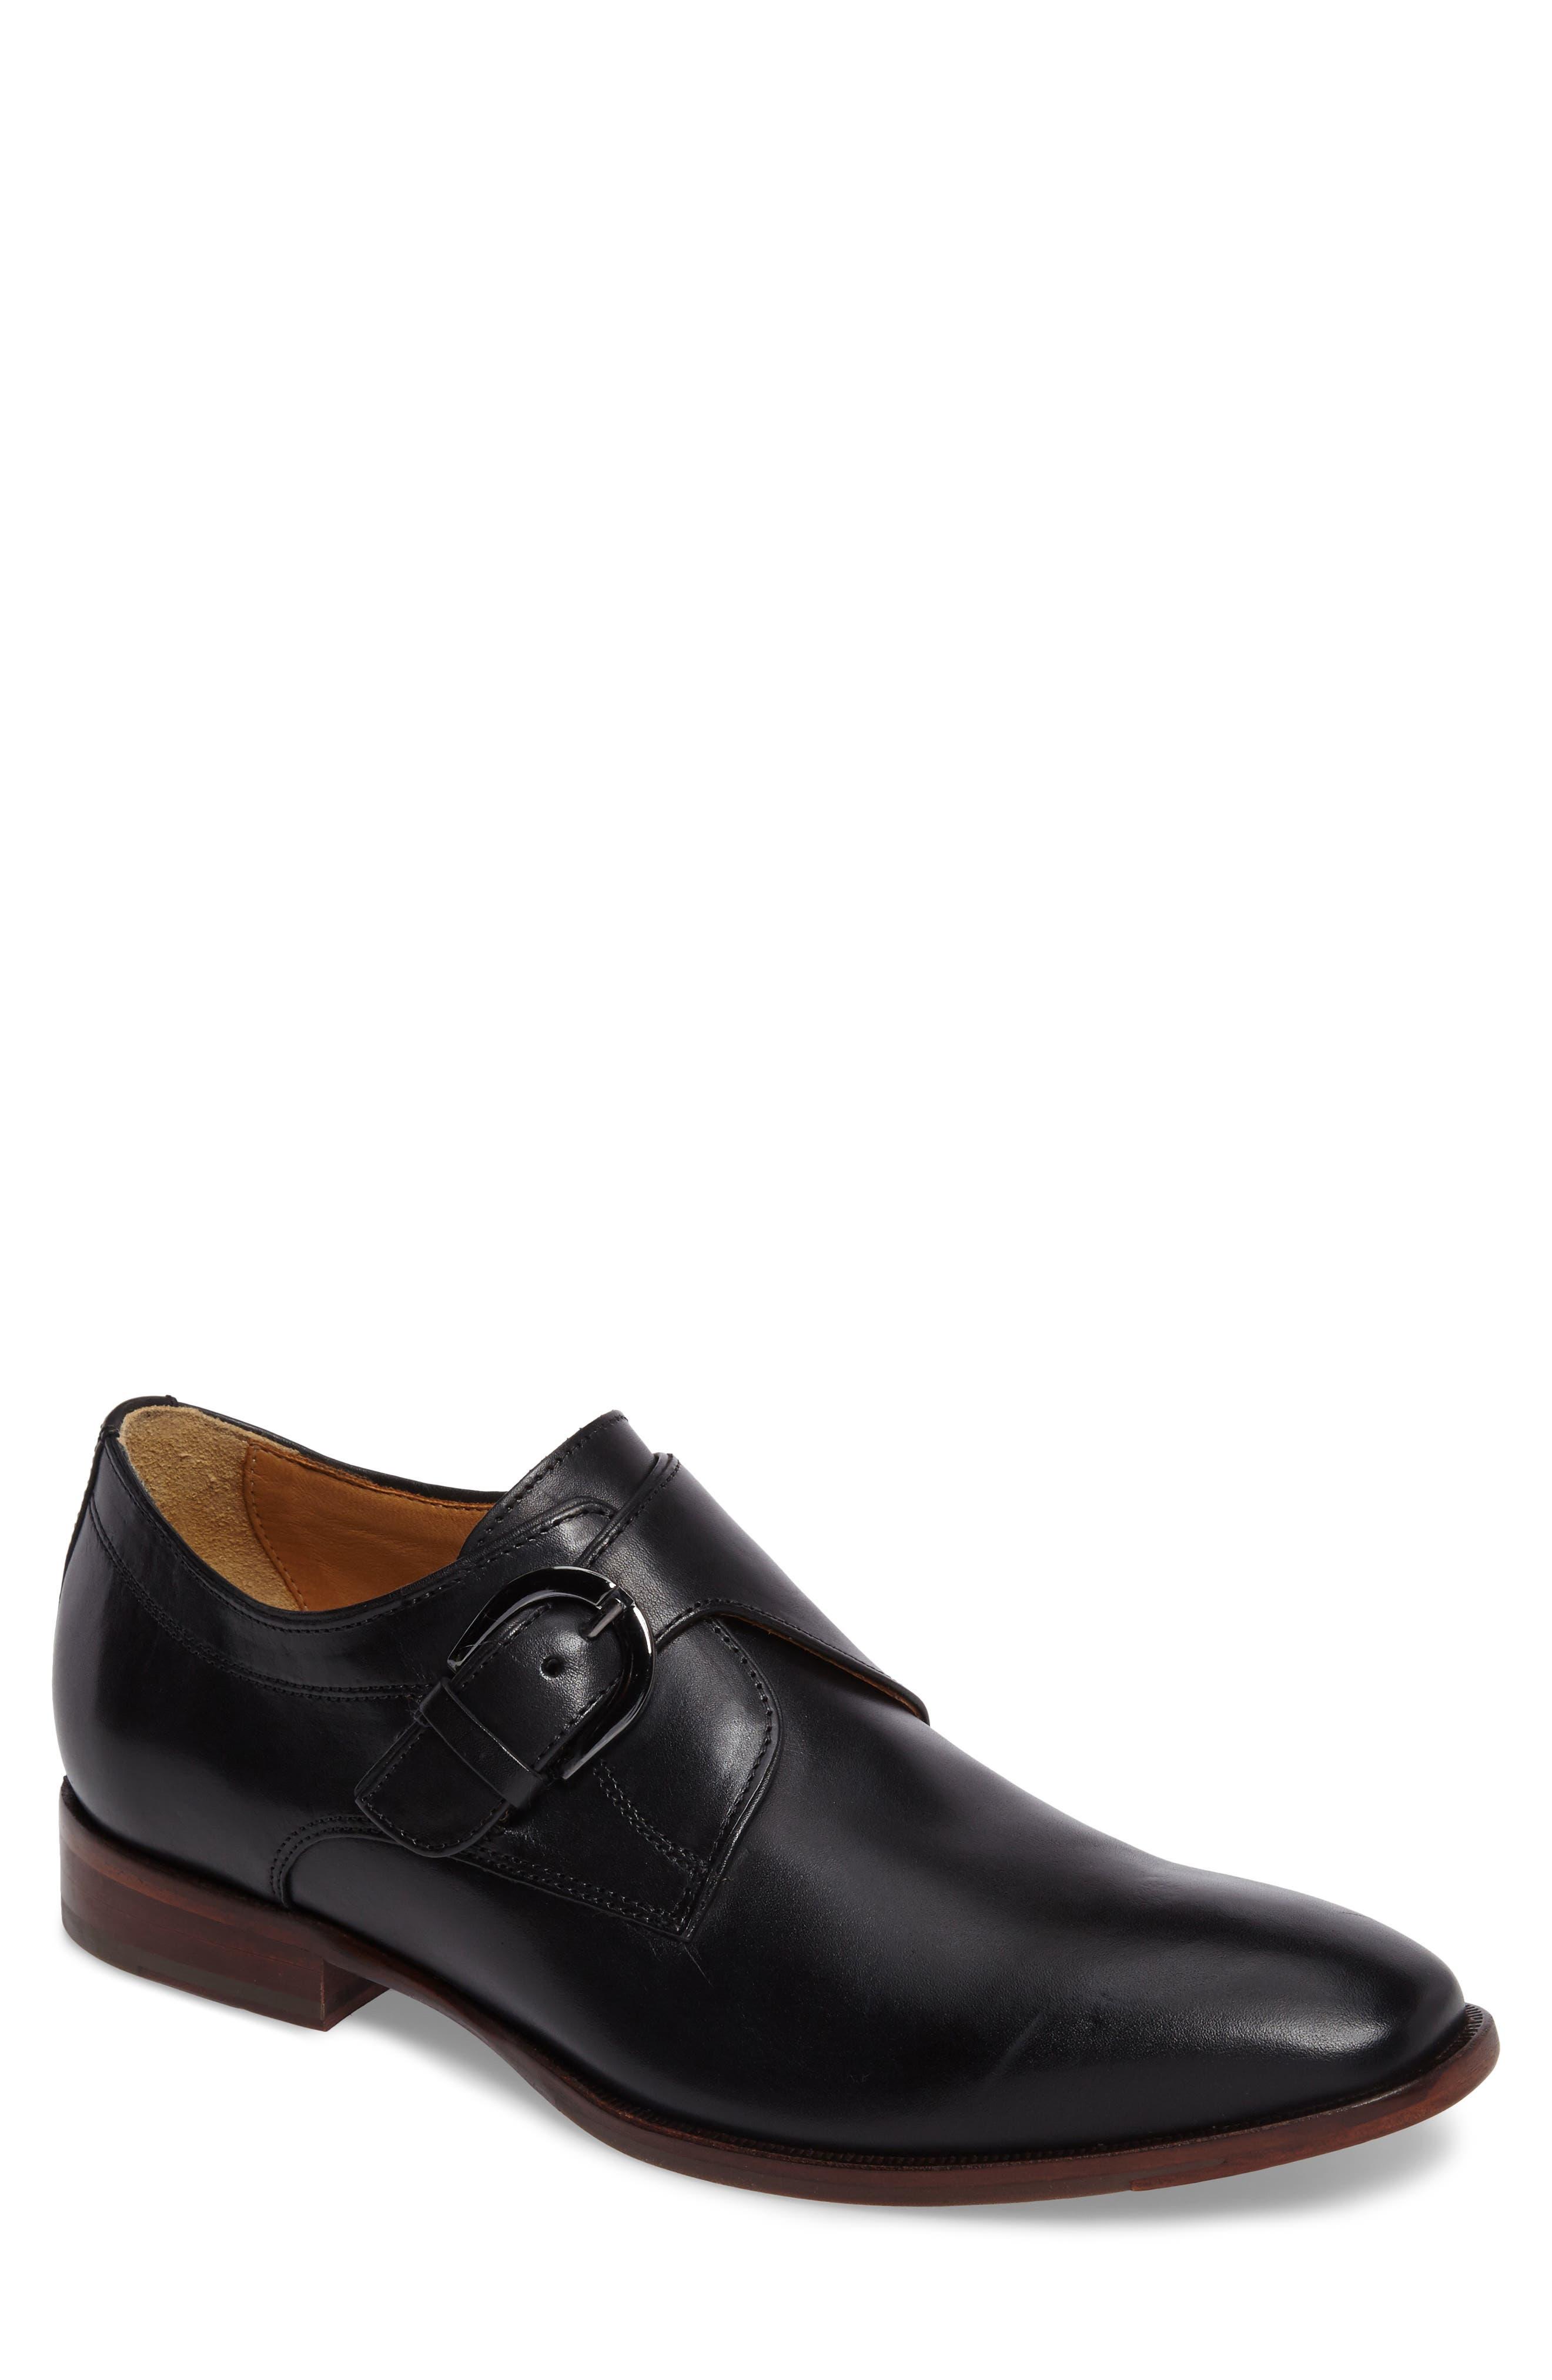 Mcclain Monk Strap Shoe